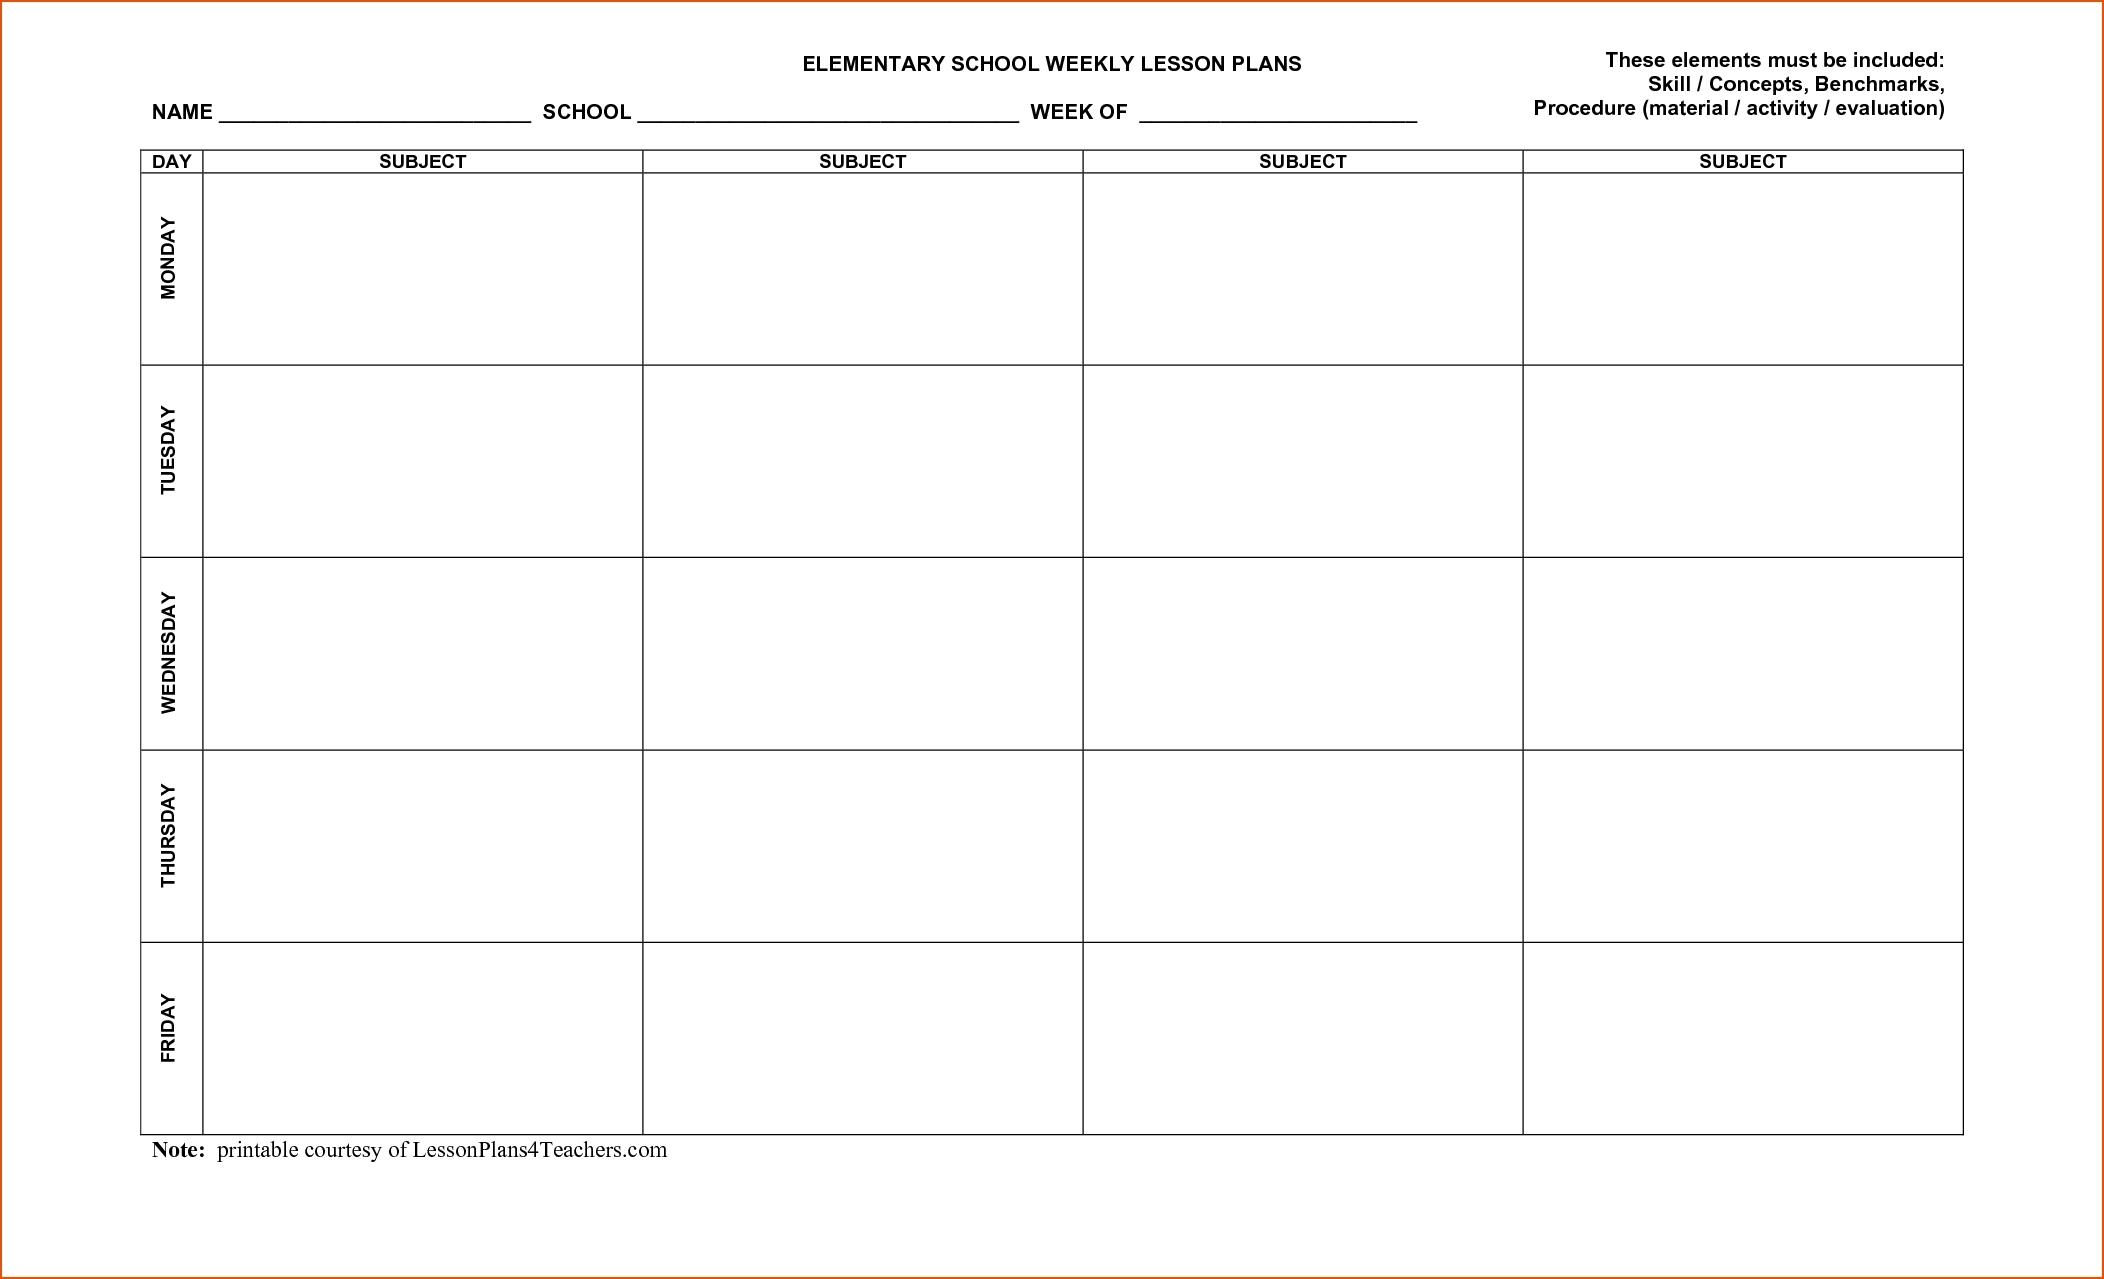 Free Printable Lesson Plan Calendars | Template Calendar Printable throughout Free Printable Lesson Plan Calendars